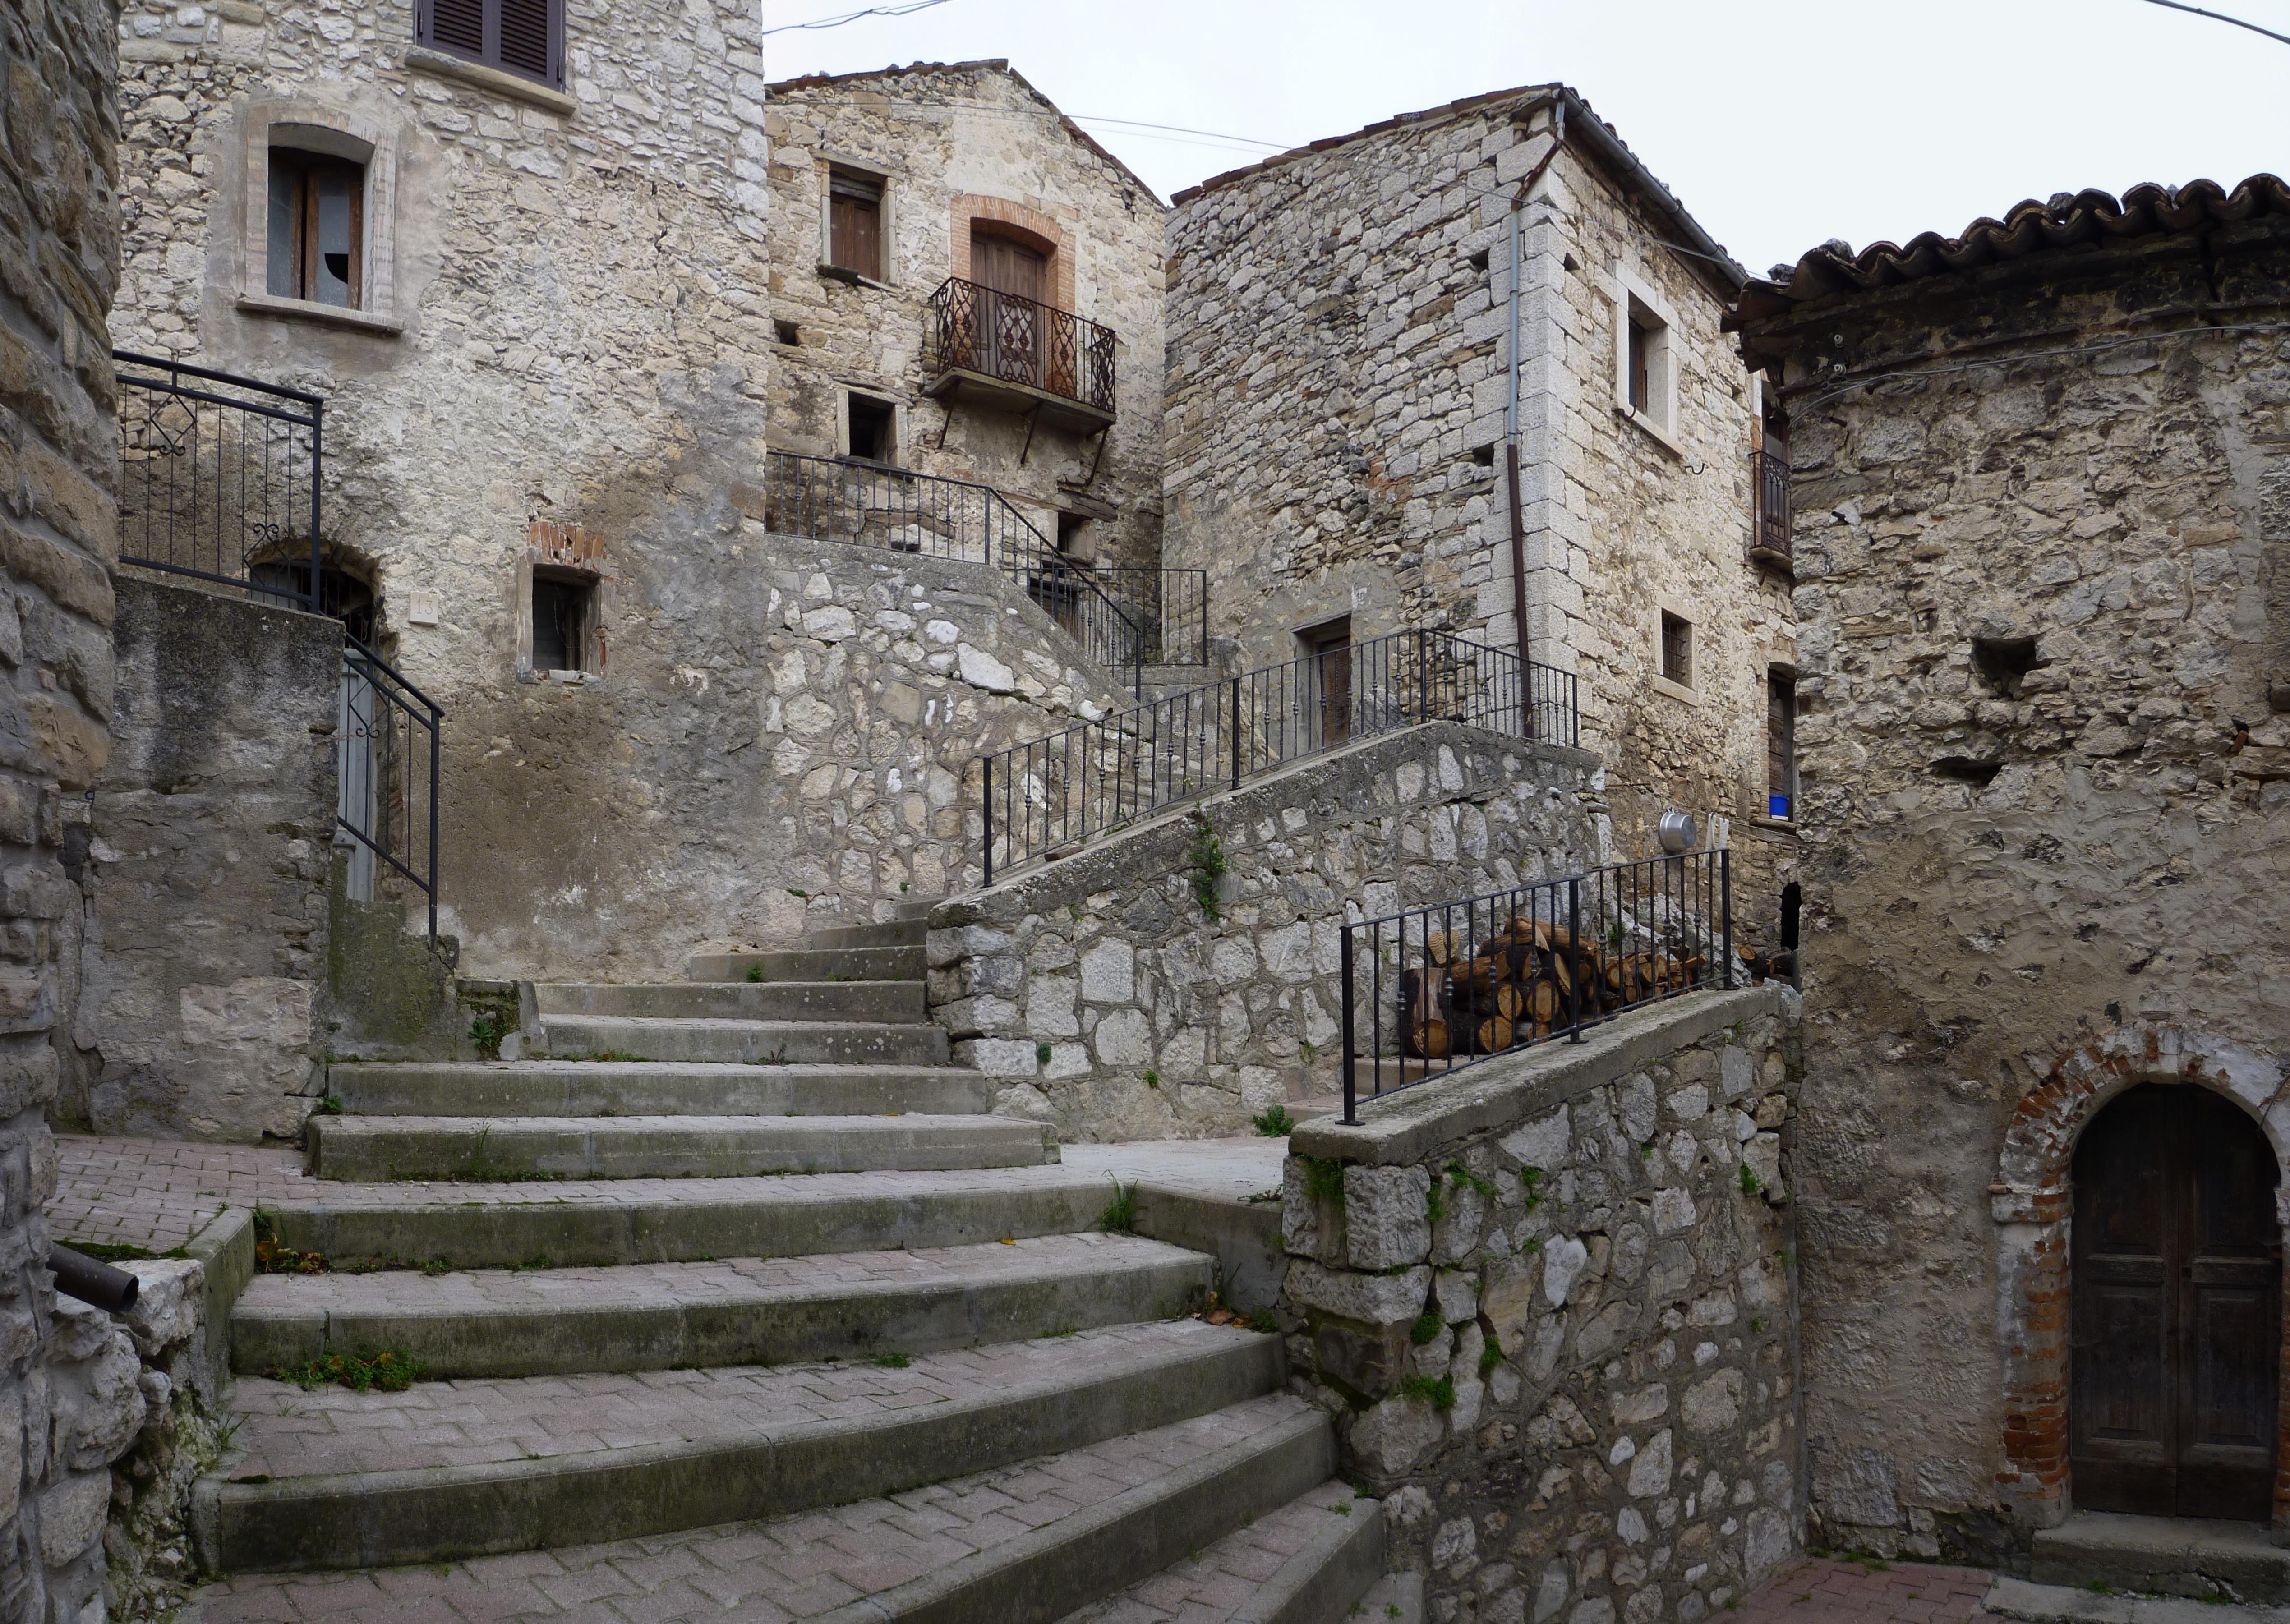 File:Centro storico Montelapiano.JPG - Wikimedia Commons